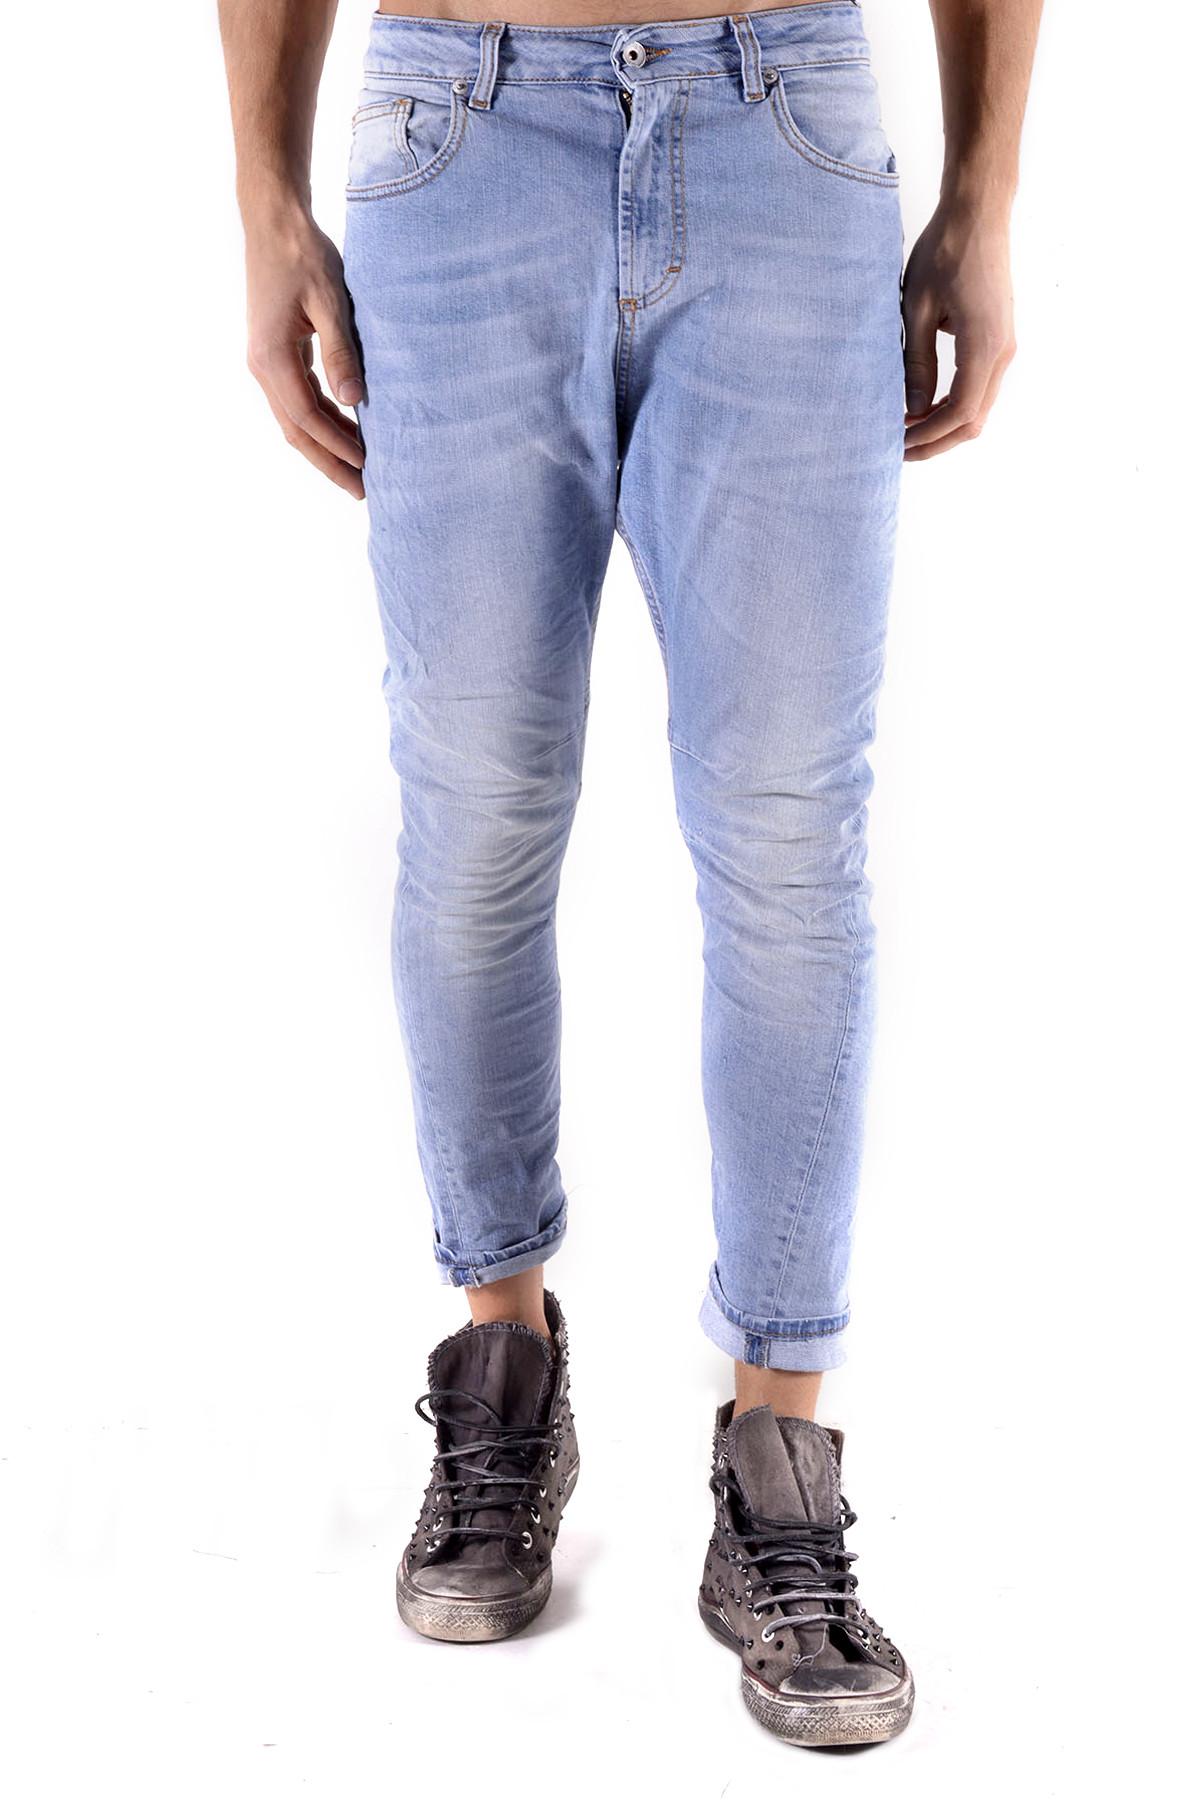 525Marchio: 525; Genere: Uomo; Tipologia: Jeans; …